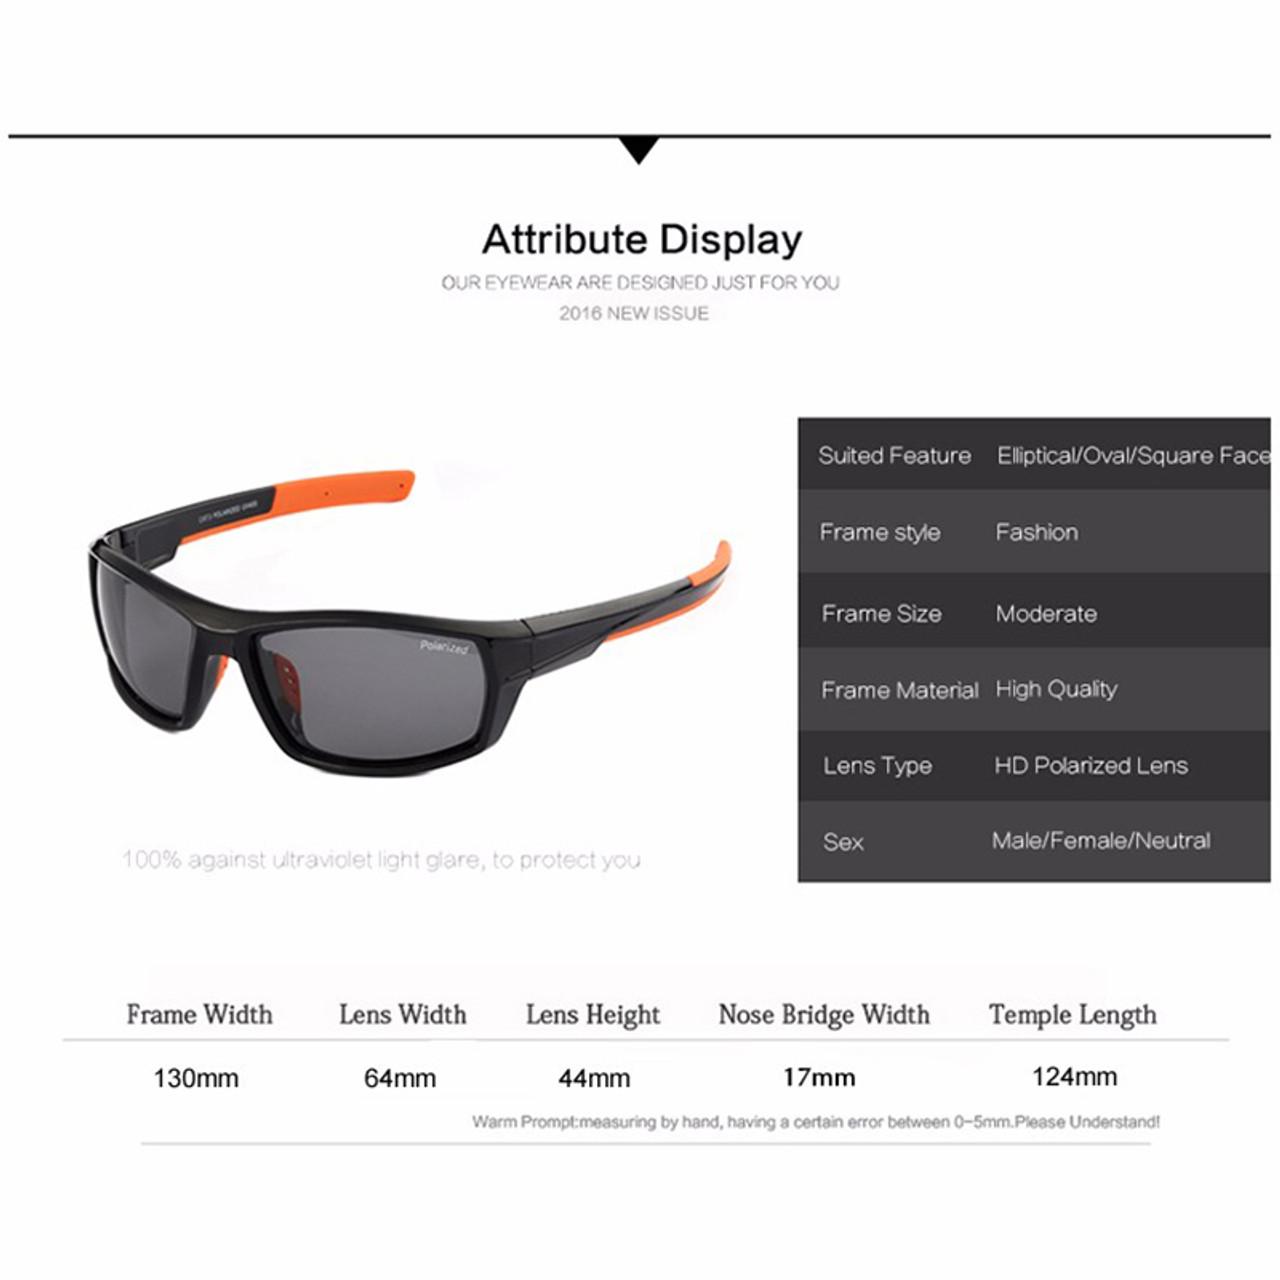 ba66eca341 ... JIANGTUN Hot Trendy Camo Black Polarized Sunglasses Men Women Brand  Designer Sports Sun Glasses UV400 Driving ...